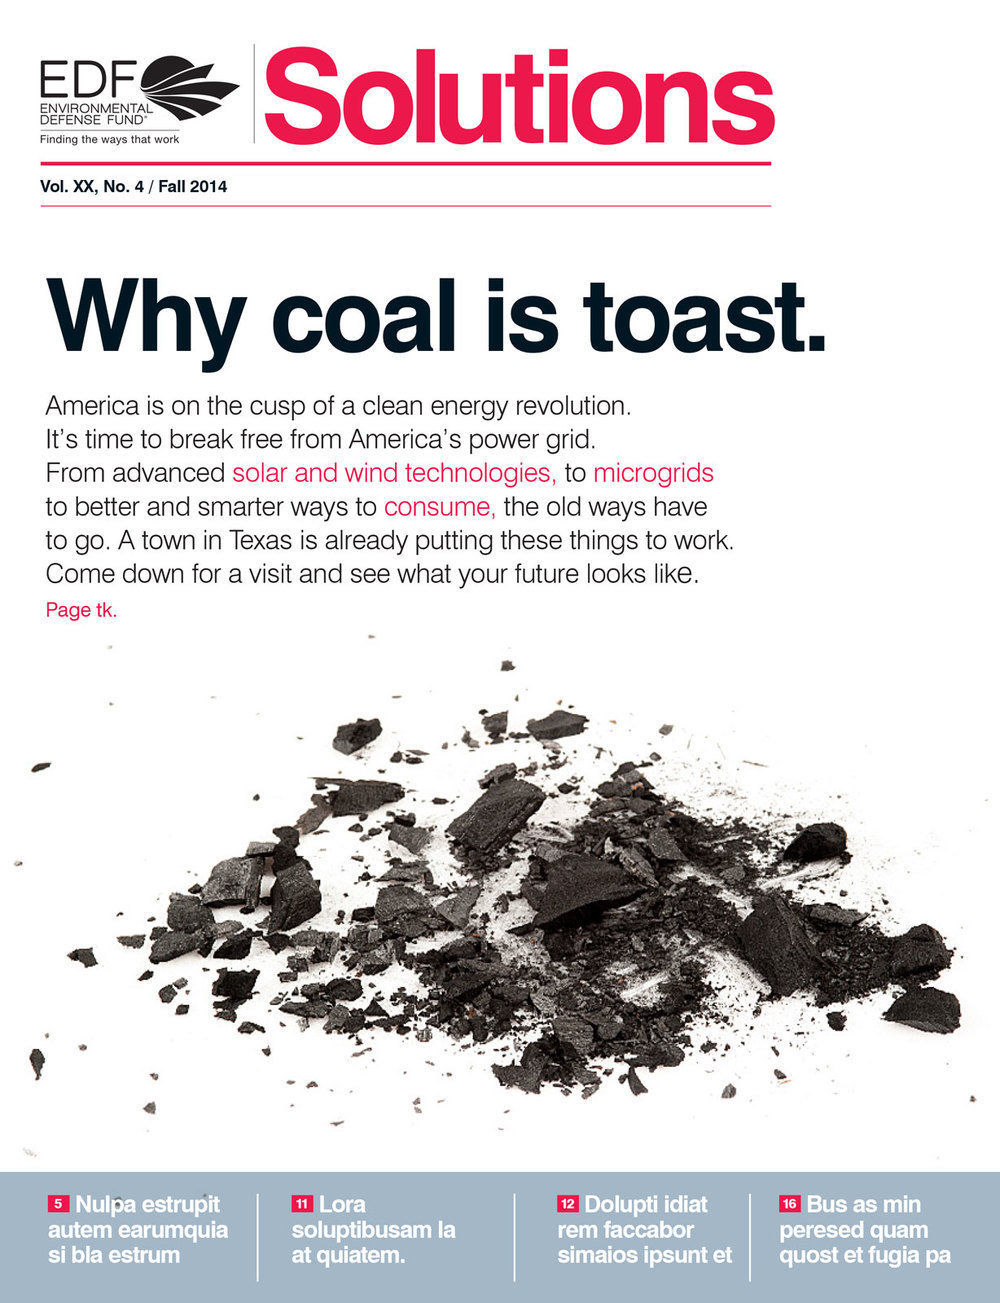 coaldust_1.jpg